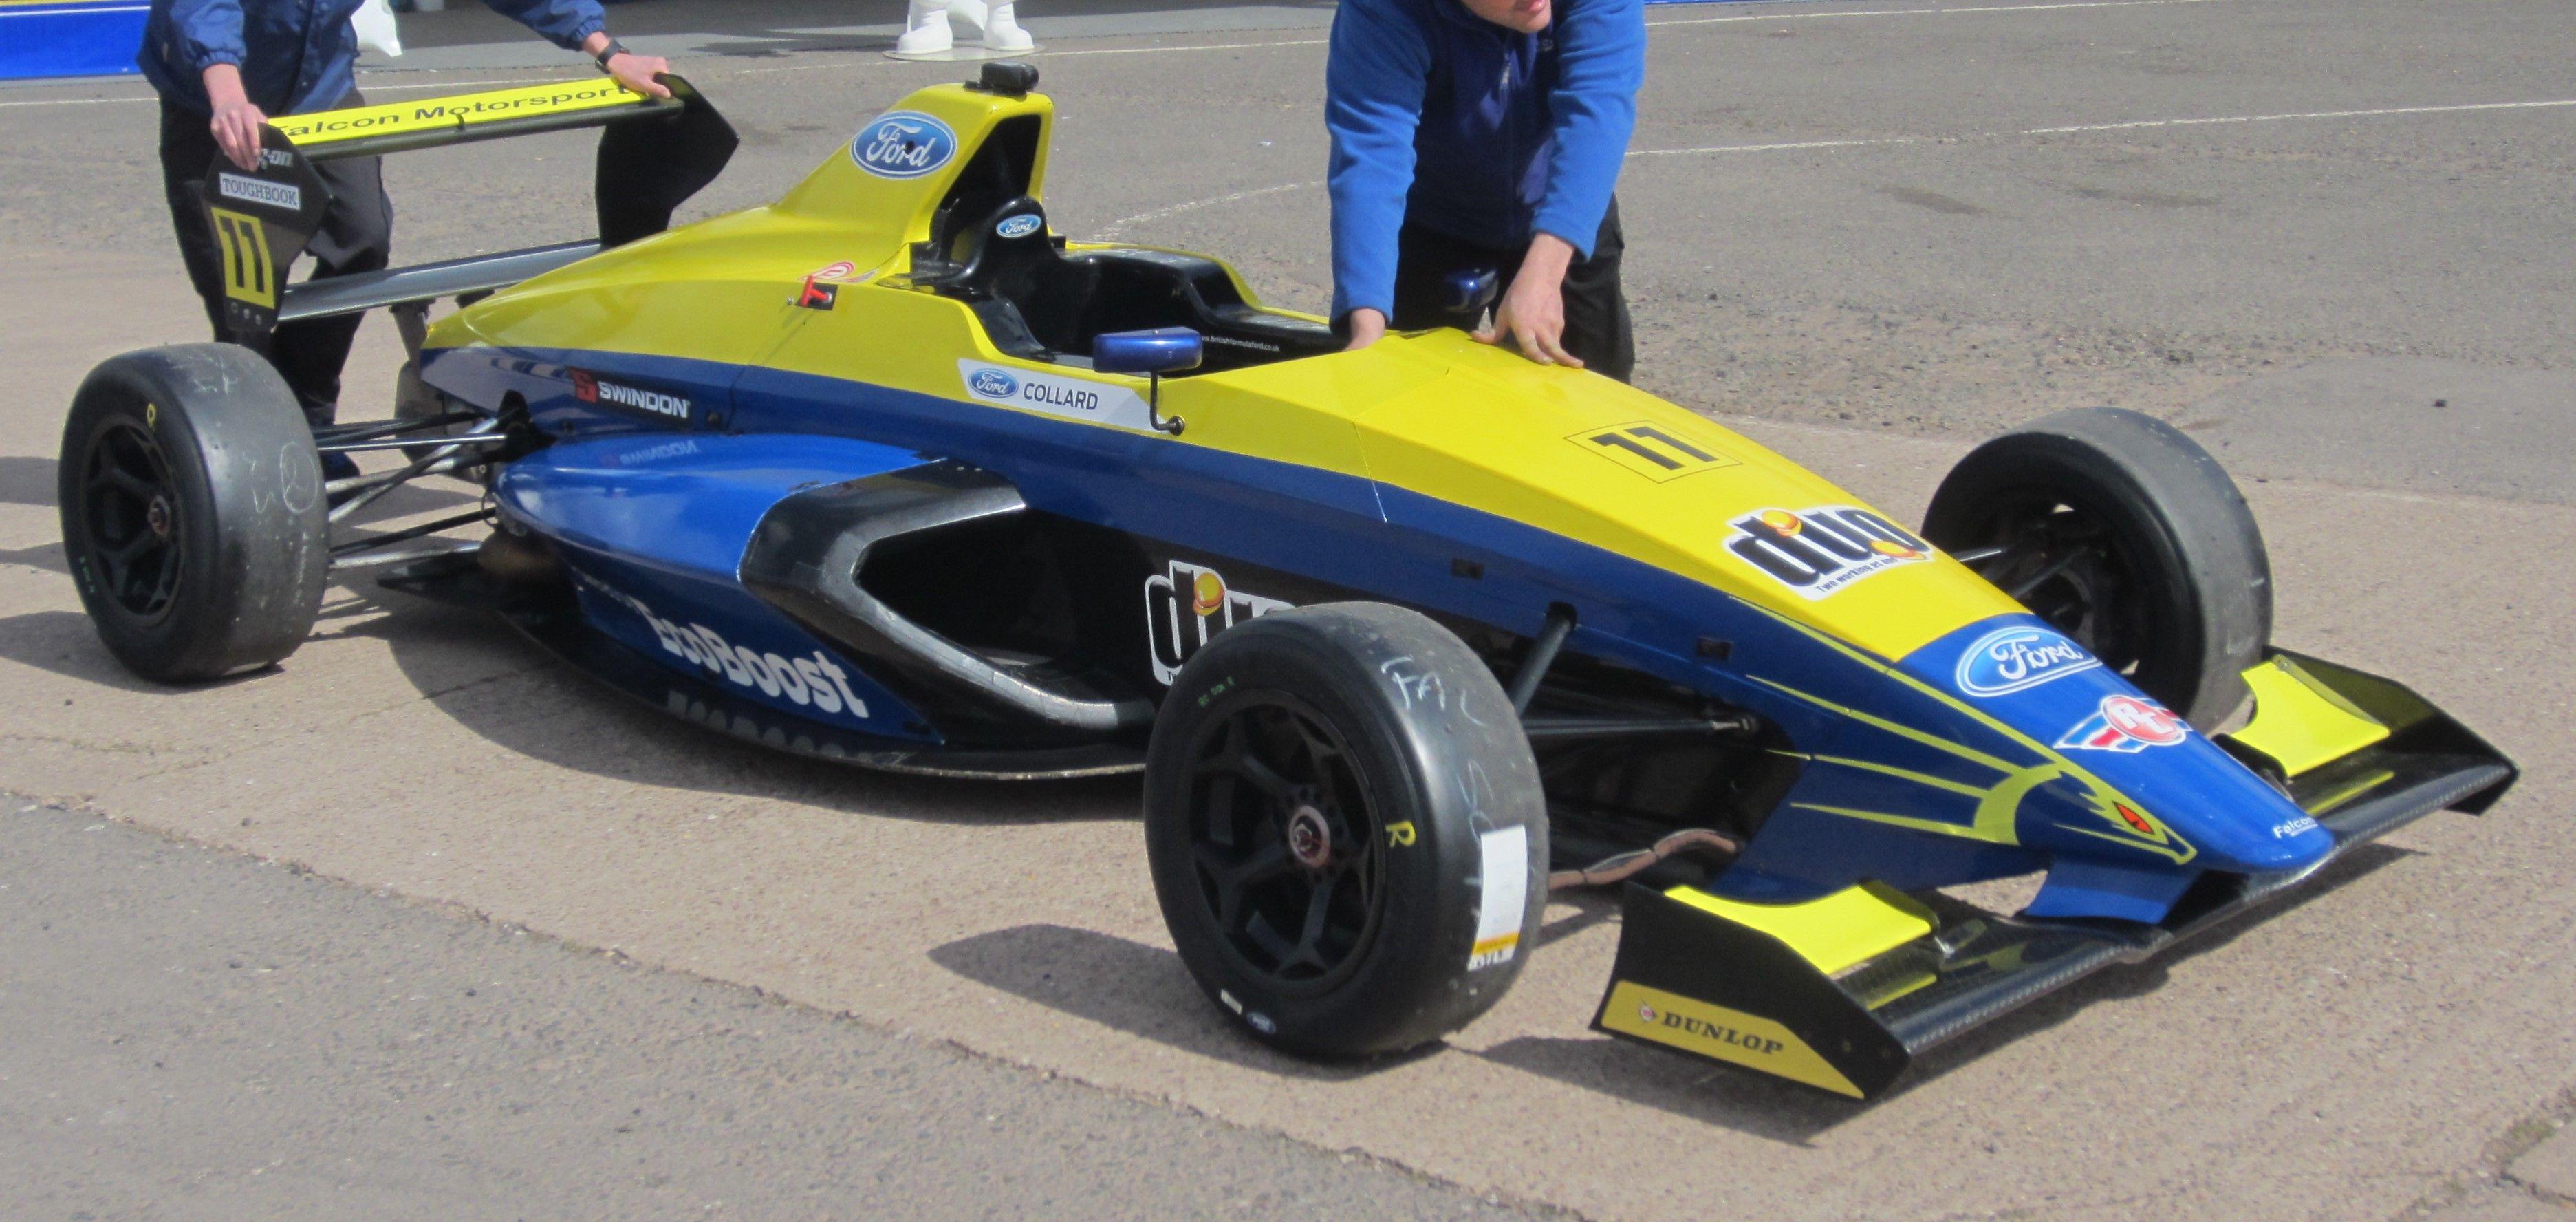 MSA Formula Ford car uses 1600cc Ford EcoBoost turbocharged engine